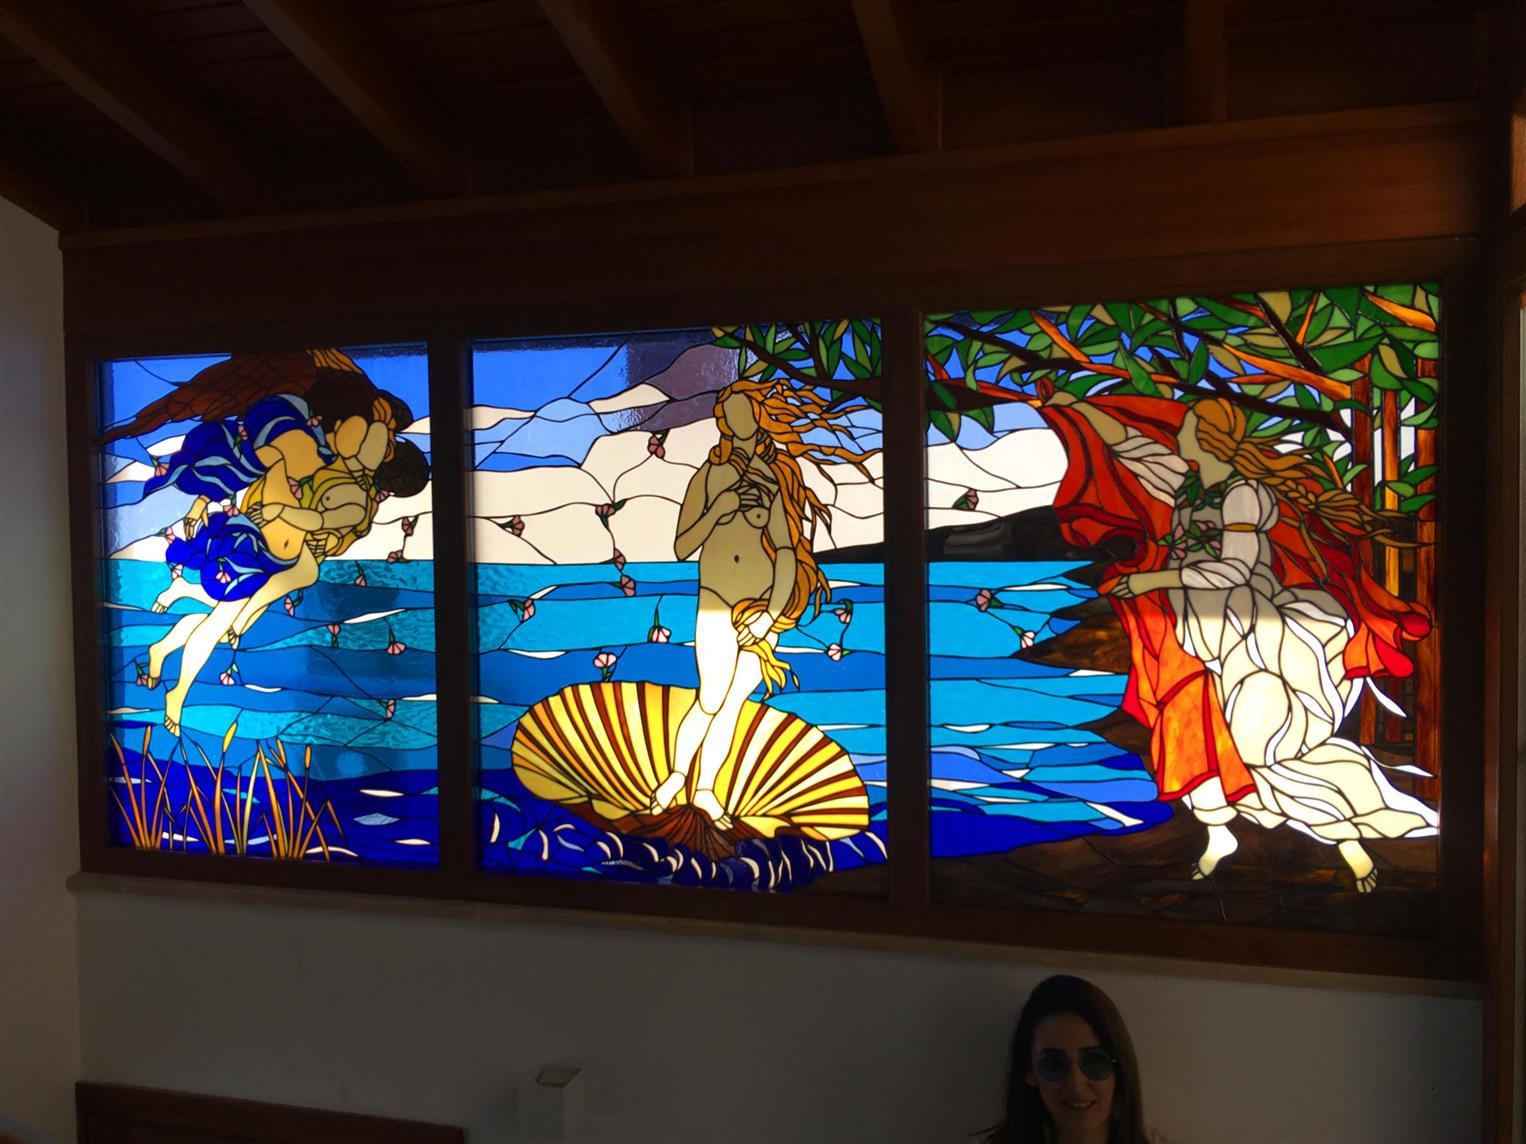 venusun-dogusu-sandro-botticelli-vitray-uyarlamasi-datca-mugla-villa202012016222227.jpg izmir vitray çalışması